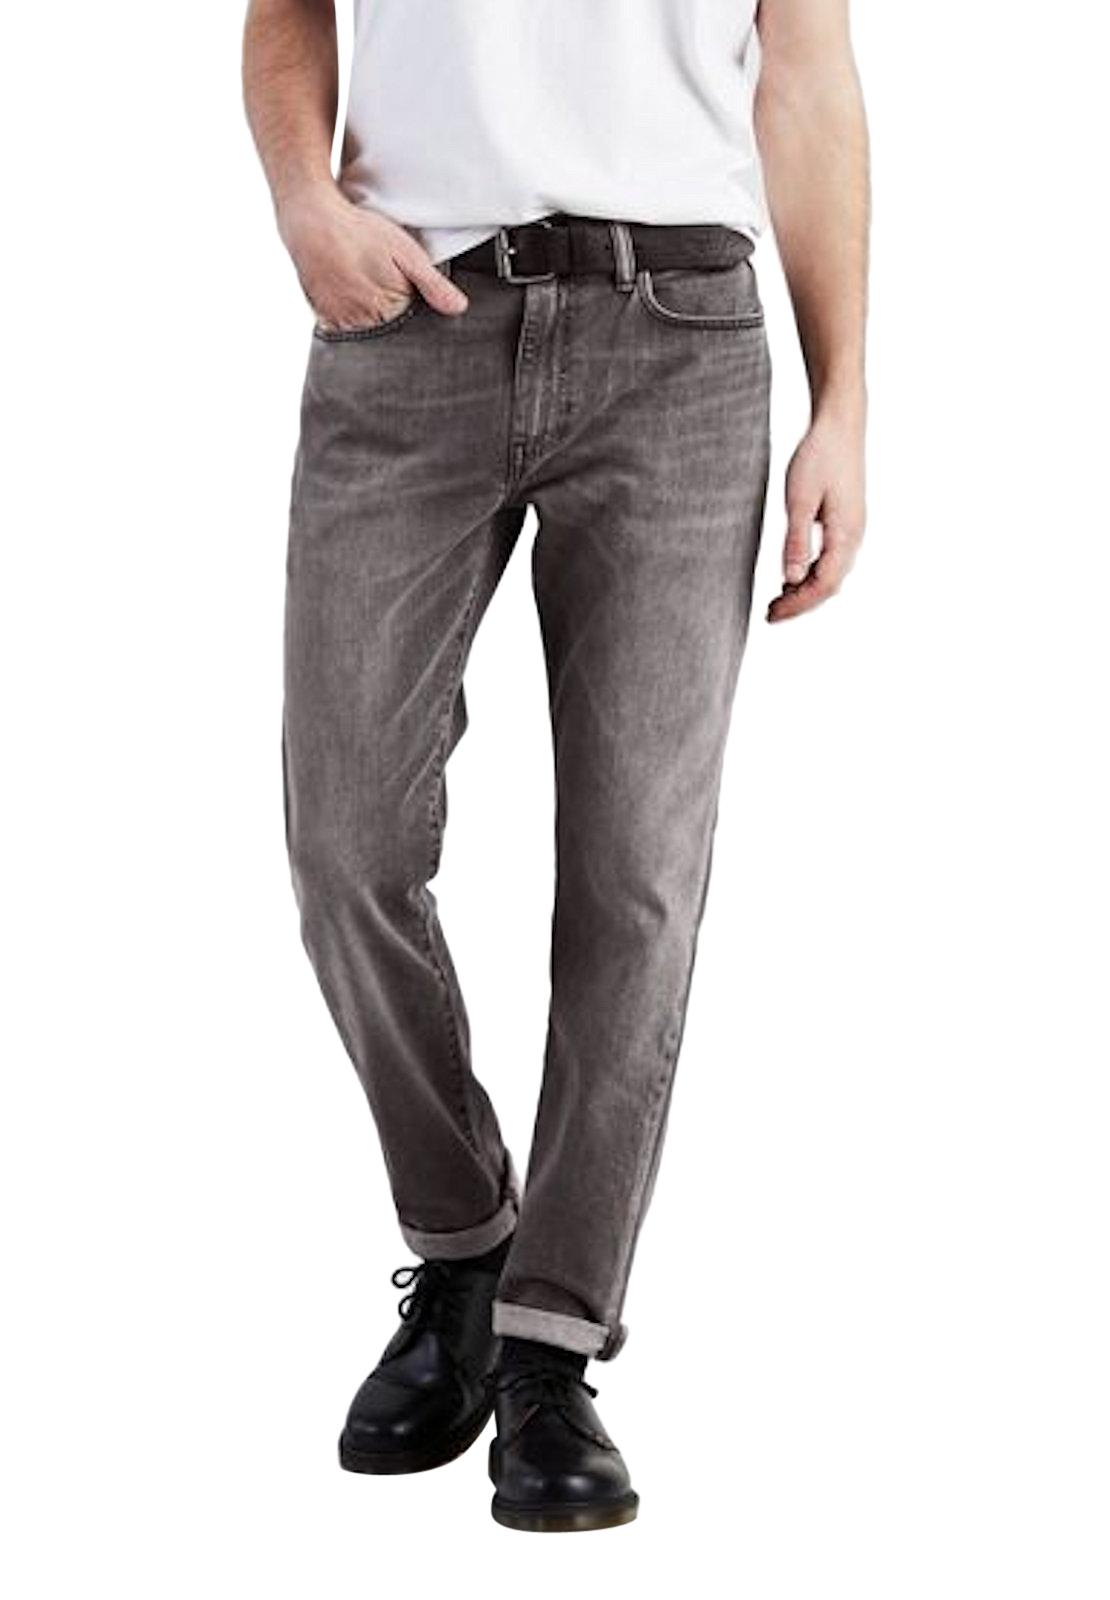 Regular Jeans East ® Taper Levi´s Fit Headed Herren 0275 29507 502 Hose Stretch XAZqOp